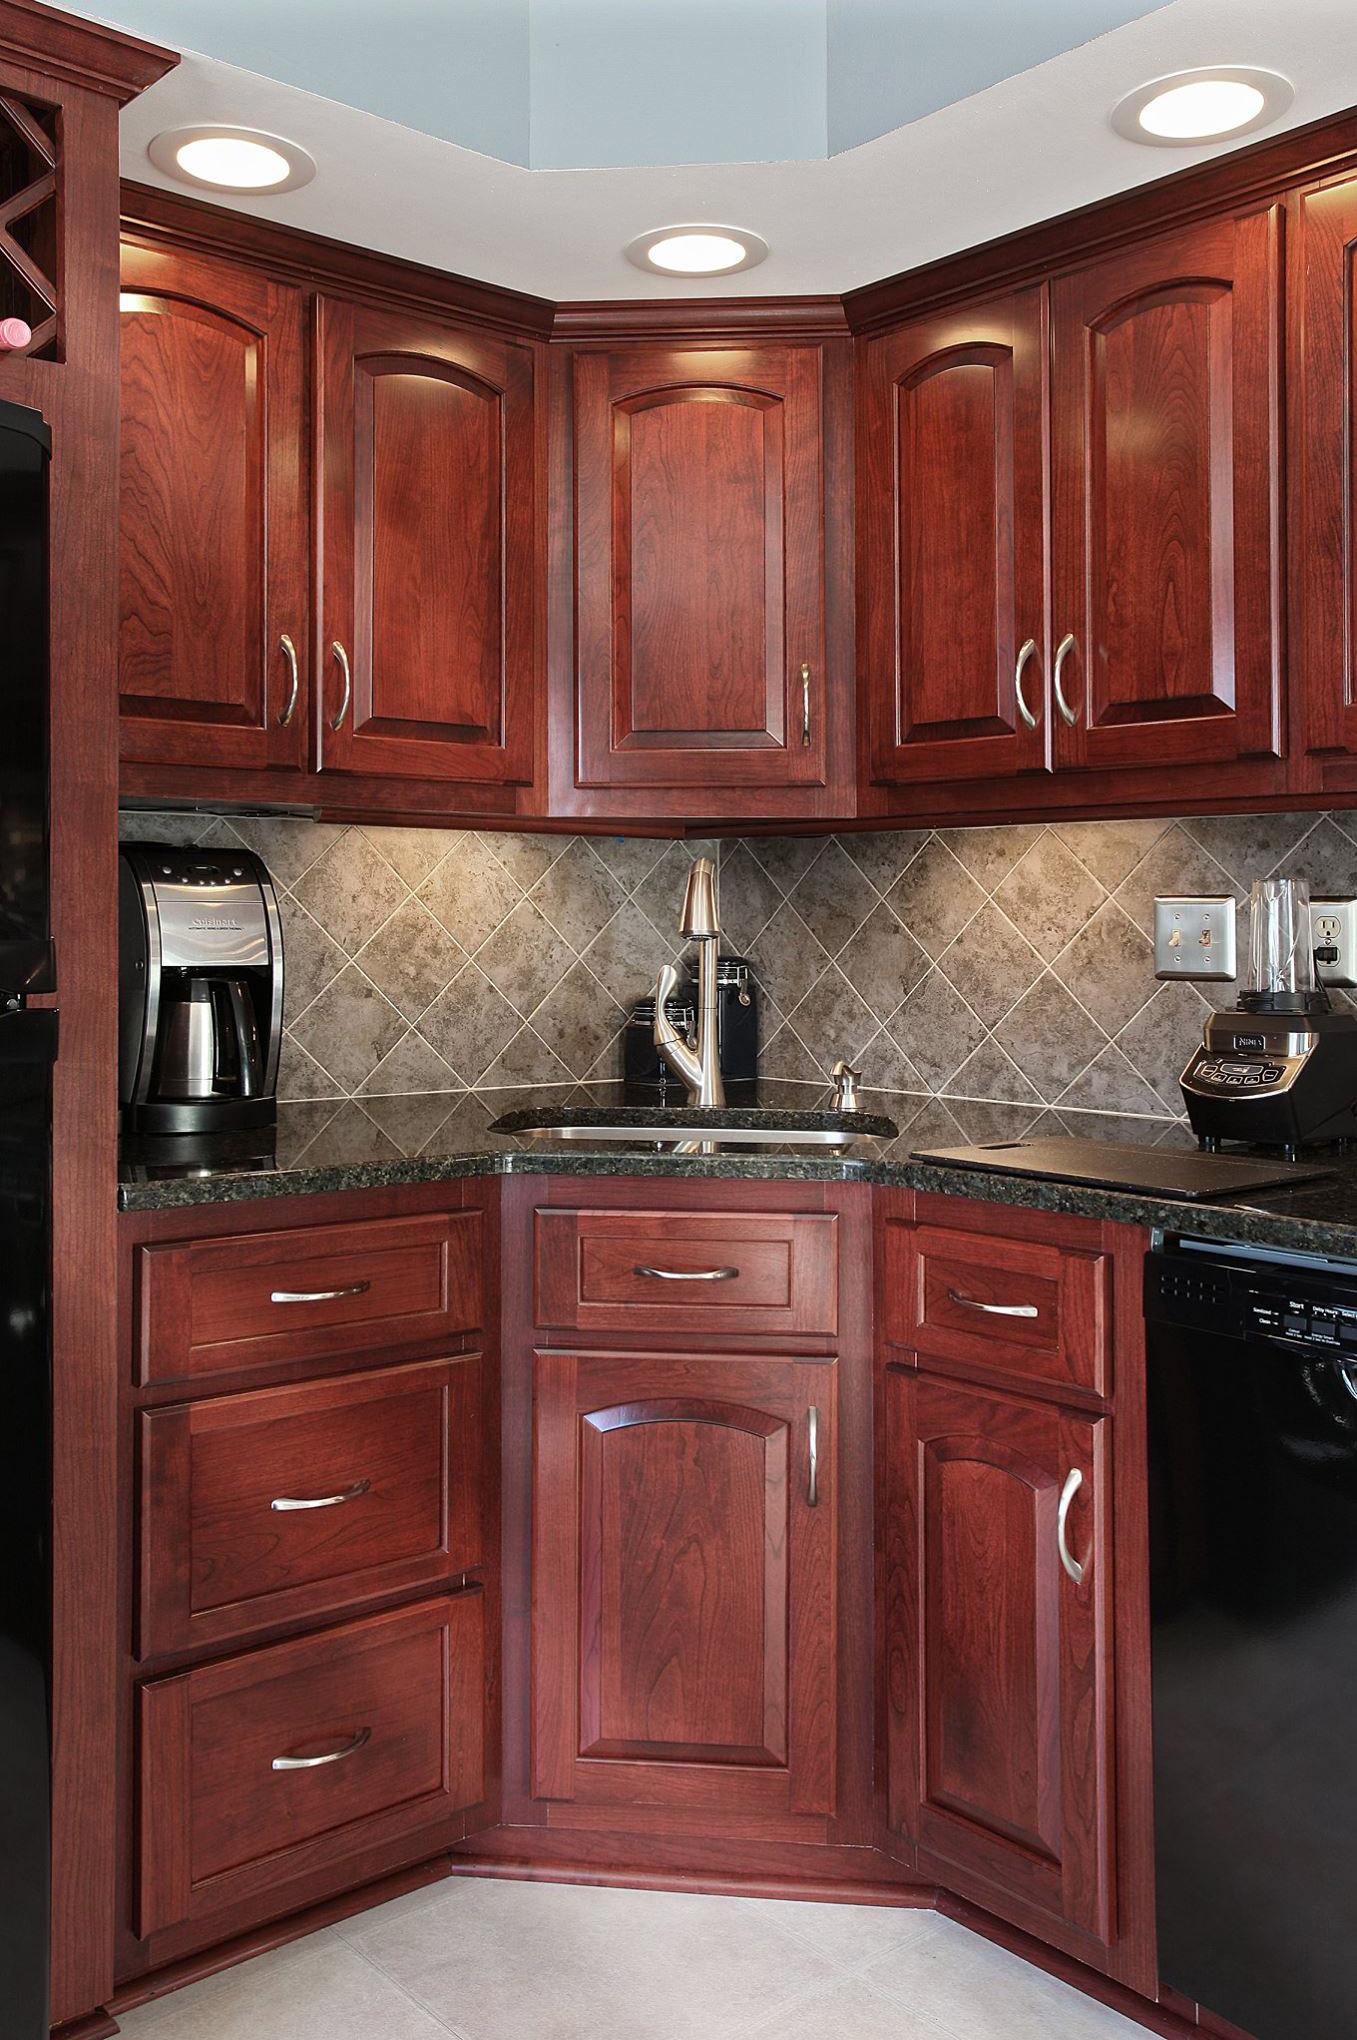 Cordovan Cherry Cabinets Paired With A Uba Tuba Granite Countertop